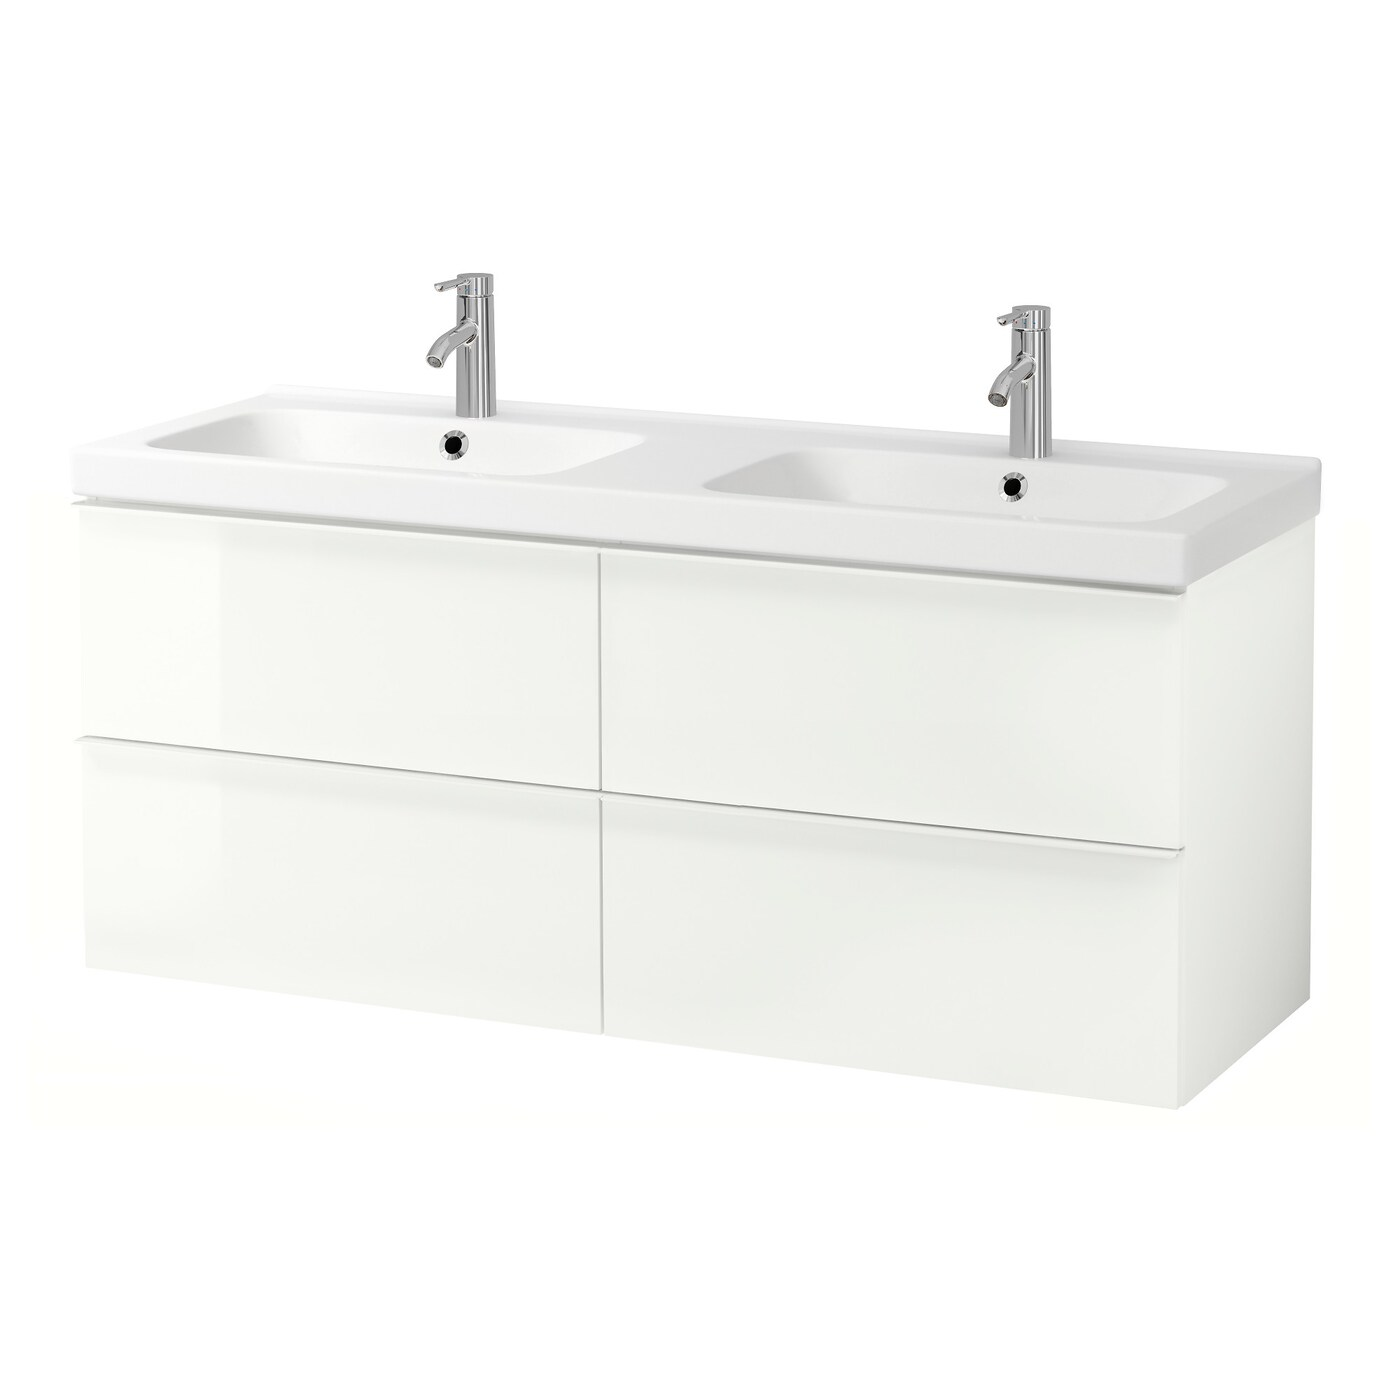 Godmorgon Odensvik Meuble Lavabo 4tir Brillant Blanc Dalskar Mitigeur Lavabo 143x49x64 Cm Ikea